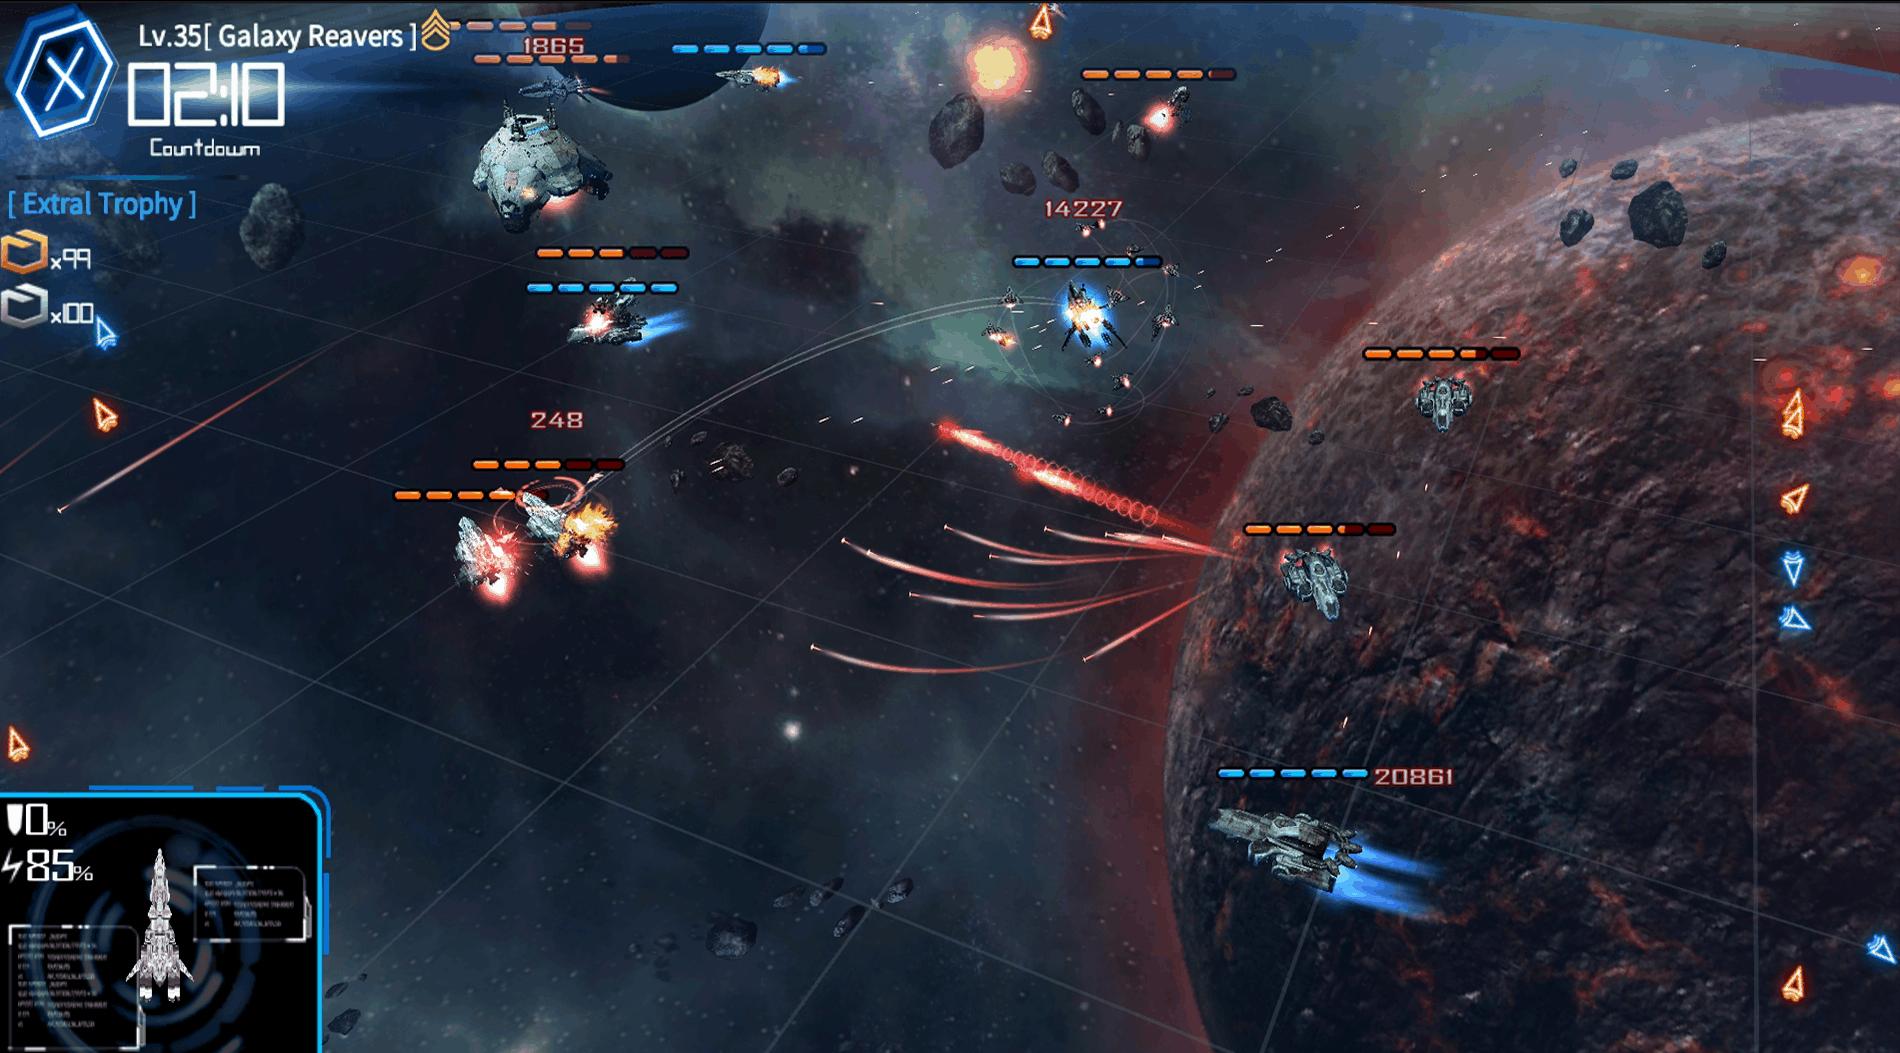 Galaxy Reavers game screenshot, battlefield